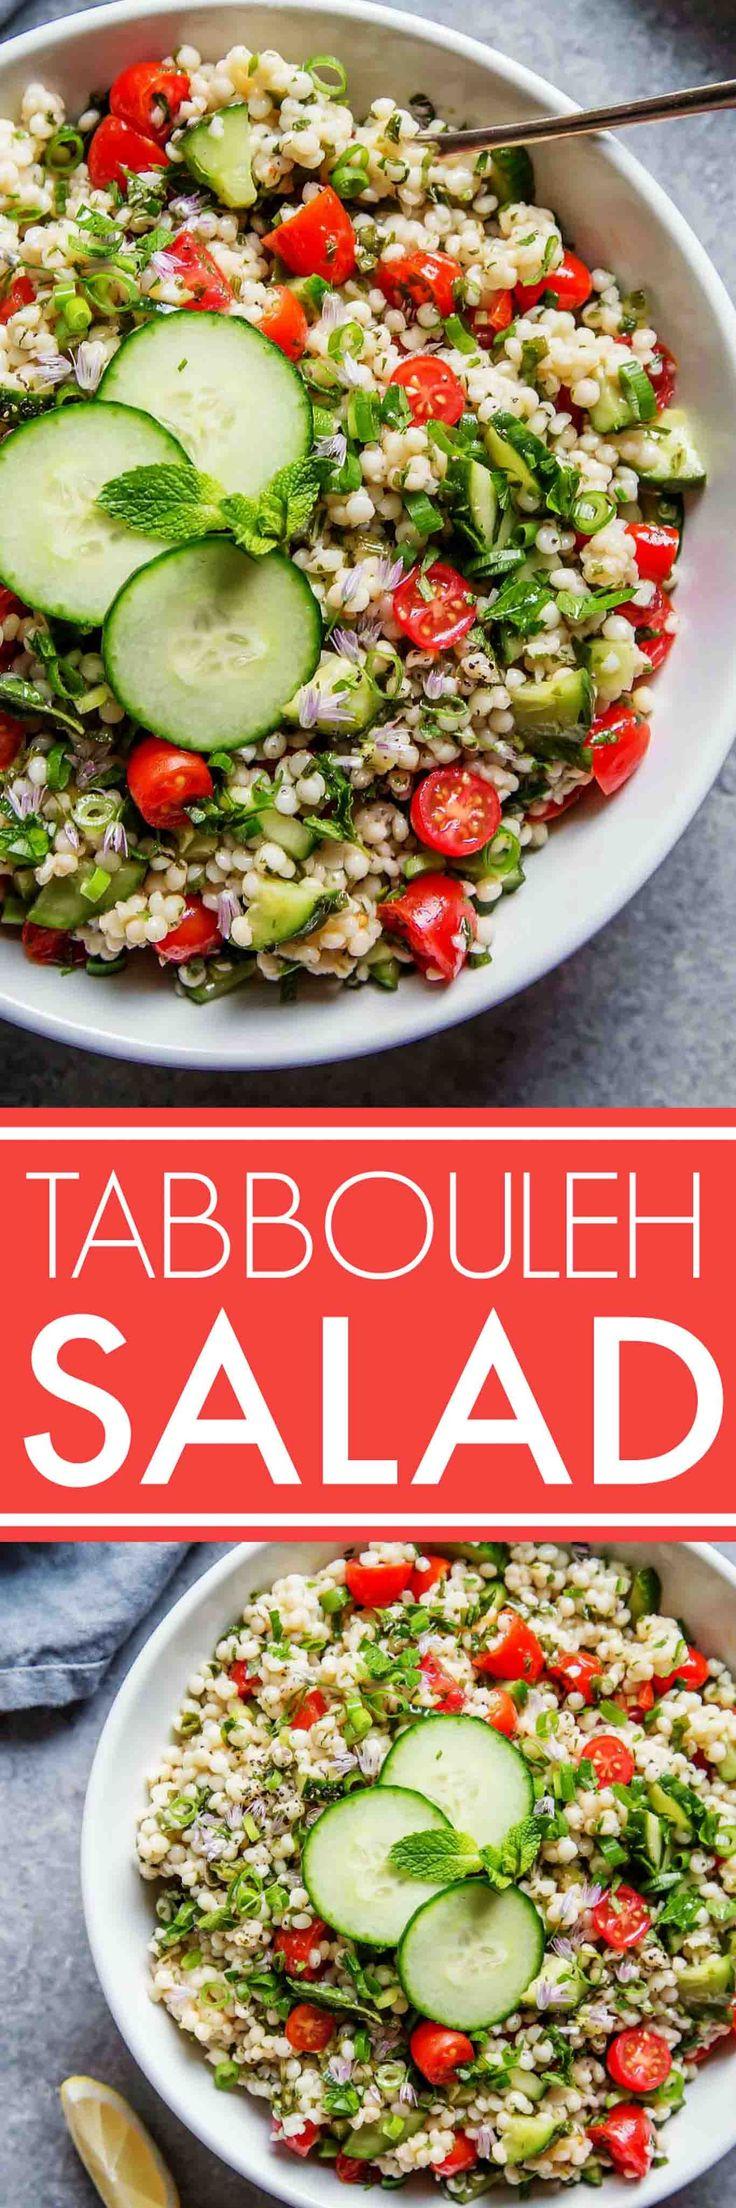 http://www.keeshndb.com/ This Israeli Couscous Tabbouleh Salad recipe combines pearl couscous with tomatoes, cucumber, fresh herbs and a light citrus dressing. It's a perfect make-ahead salad recipe! | platingsandpairin... #keeshndb @foodvinerecipes, @foodfinderdiaryhttp://www.platingsandpairings.com/israeli-couscous-tabbouleh-salad/